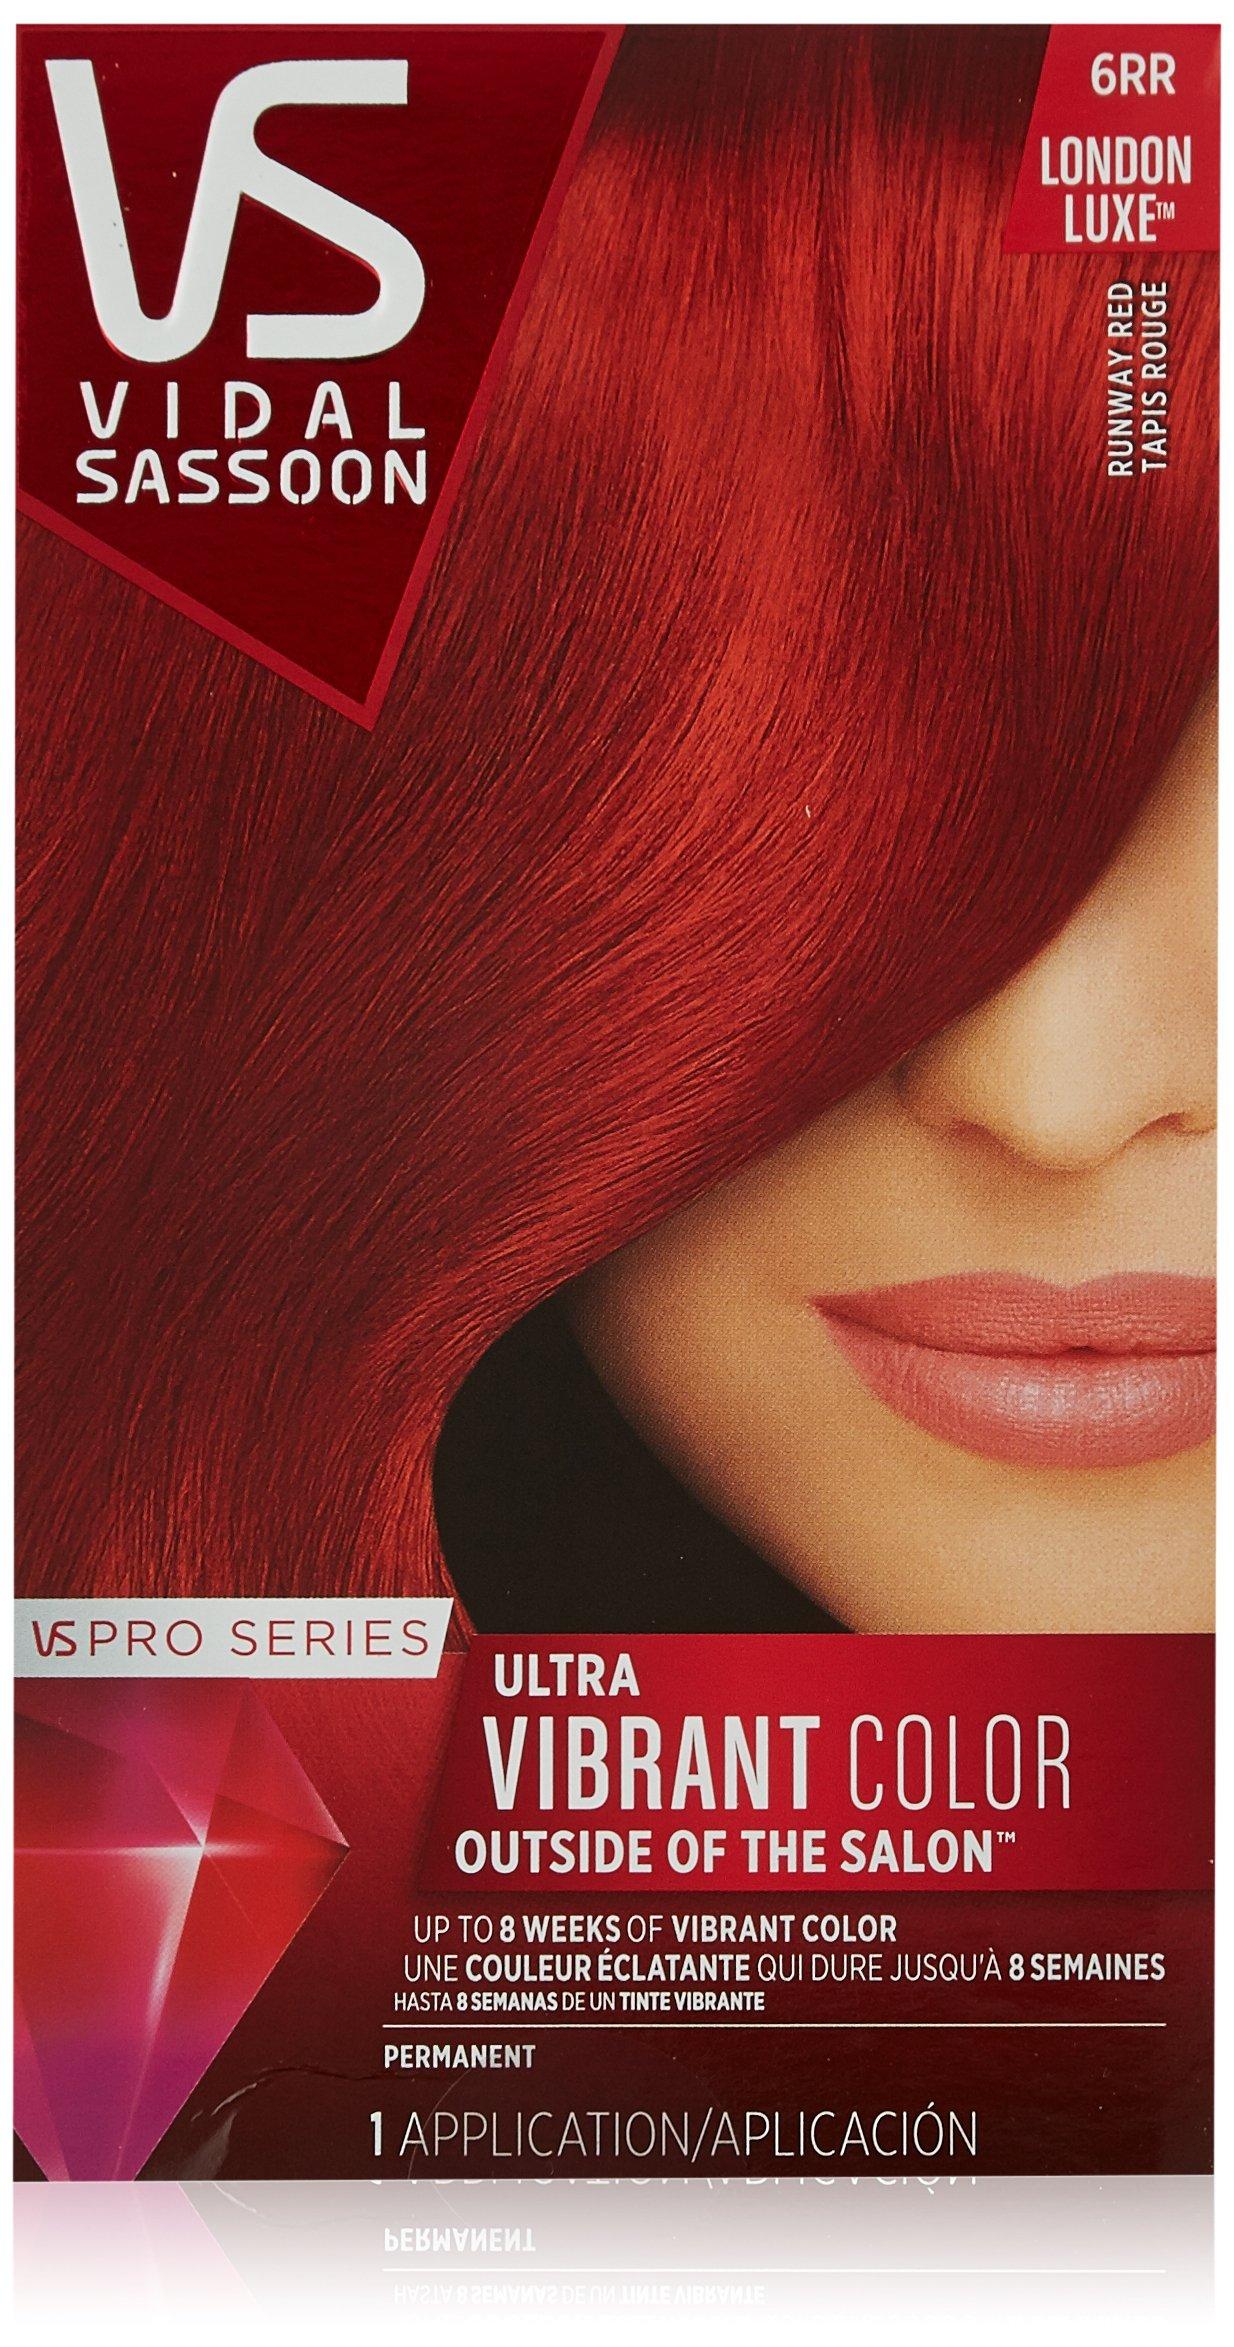 Vidal Sassoon London Luxe 6rr Runway Red 1 Kit